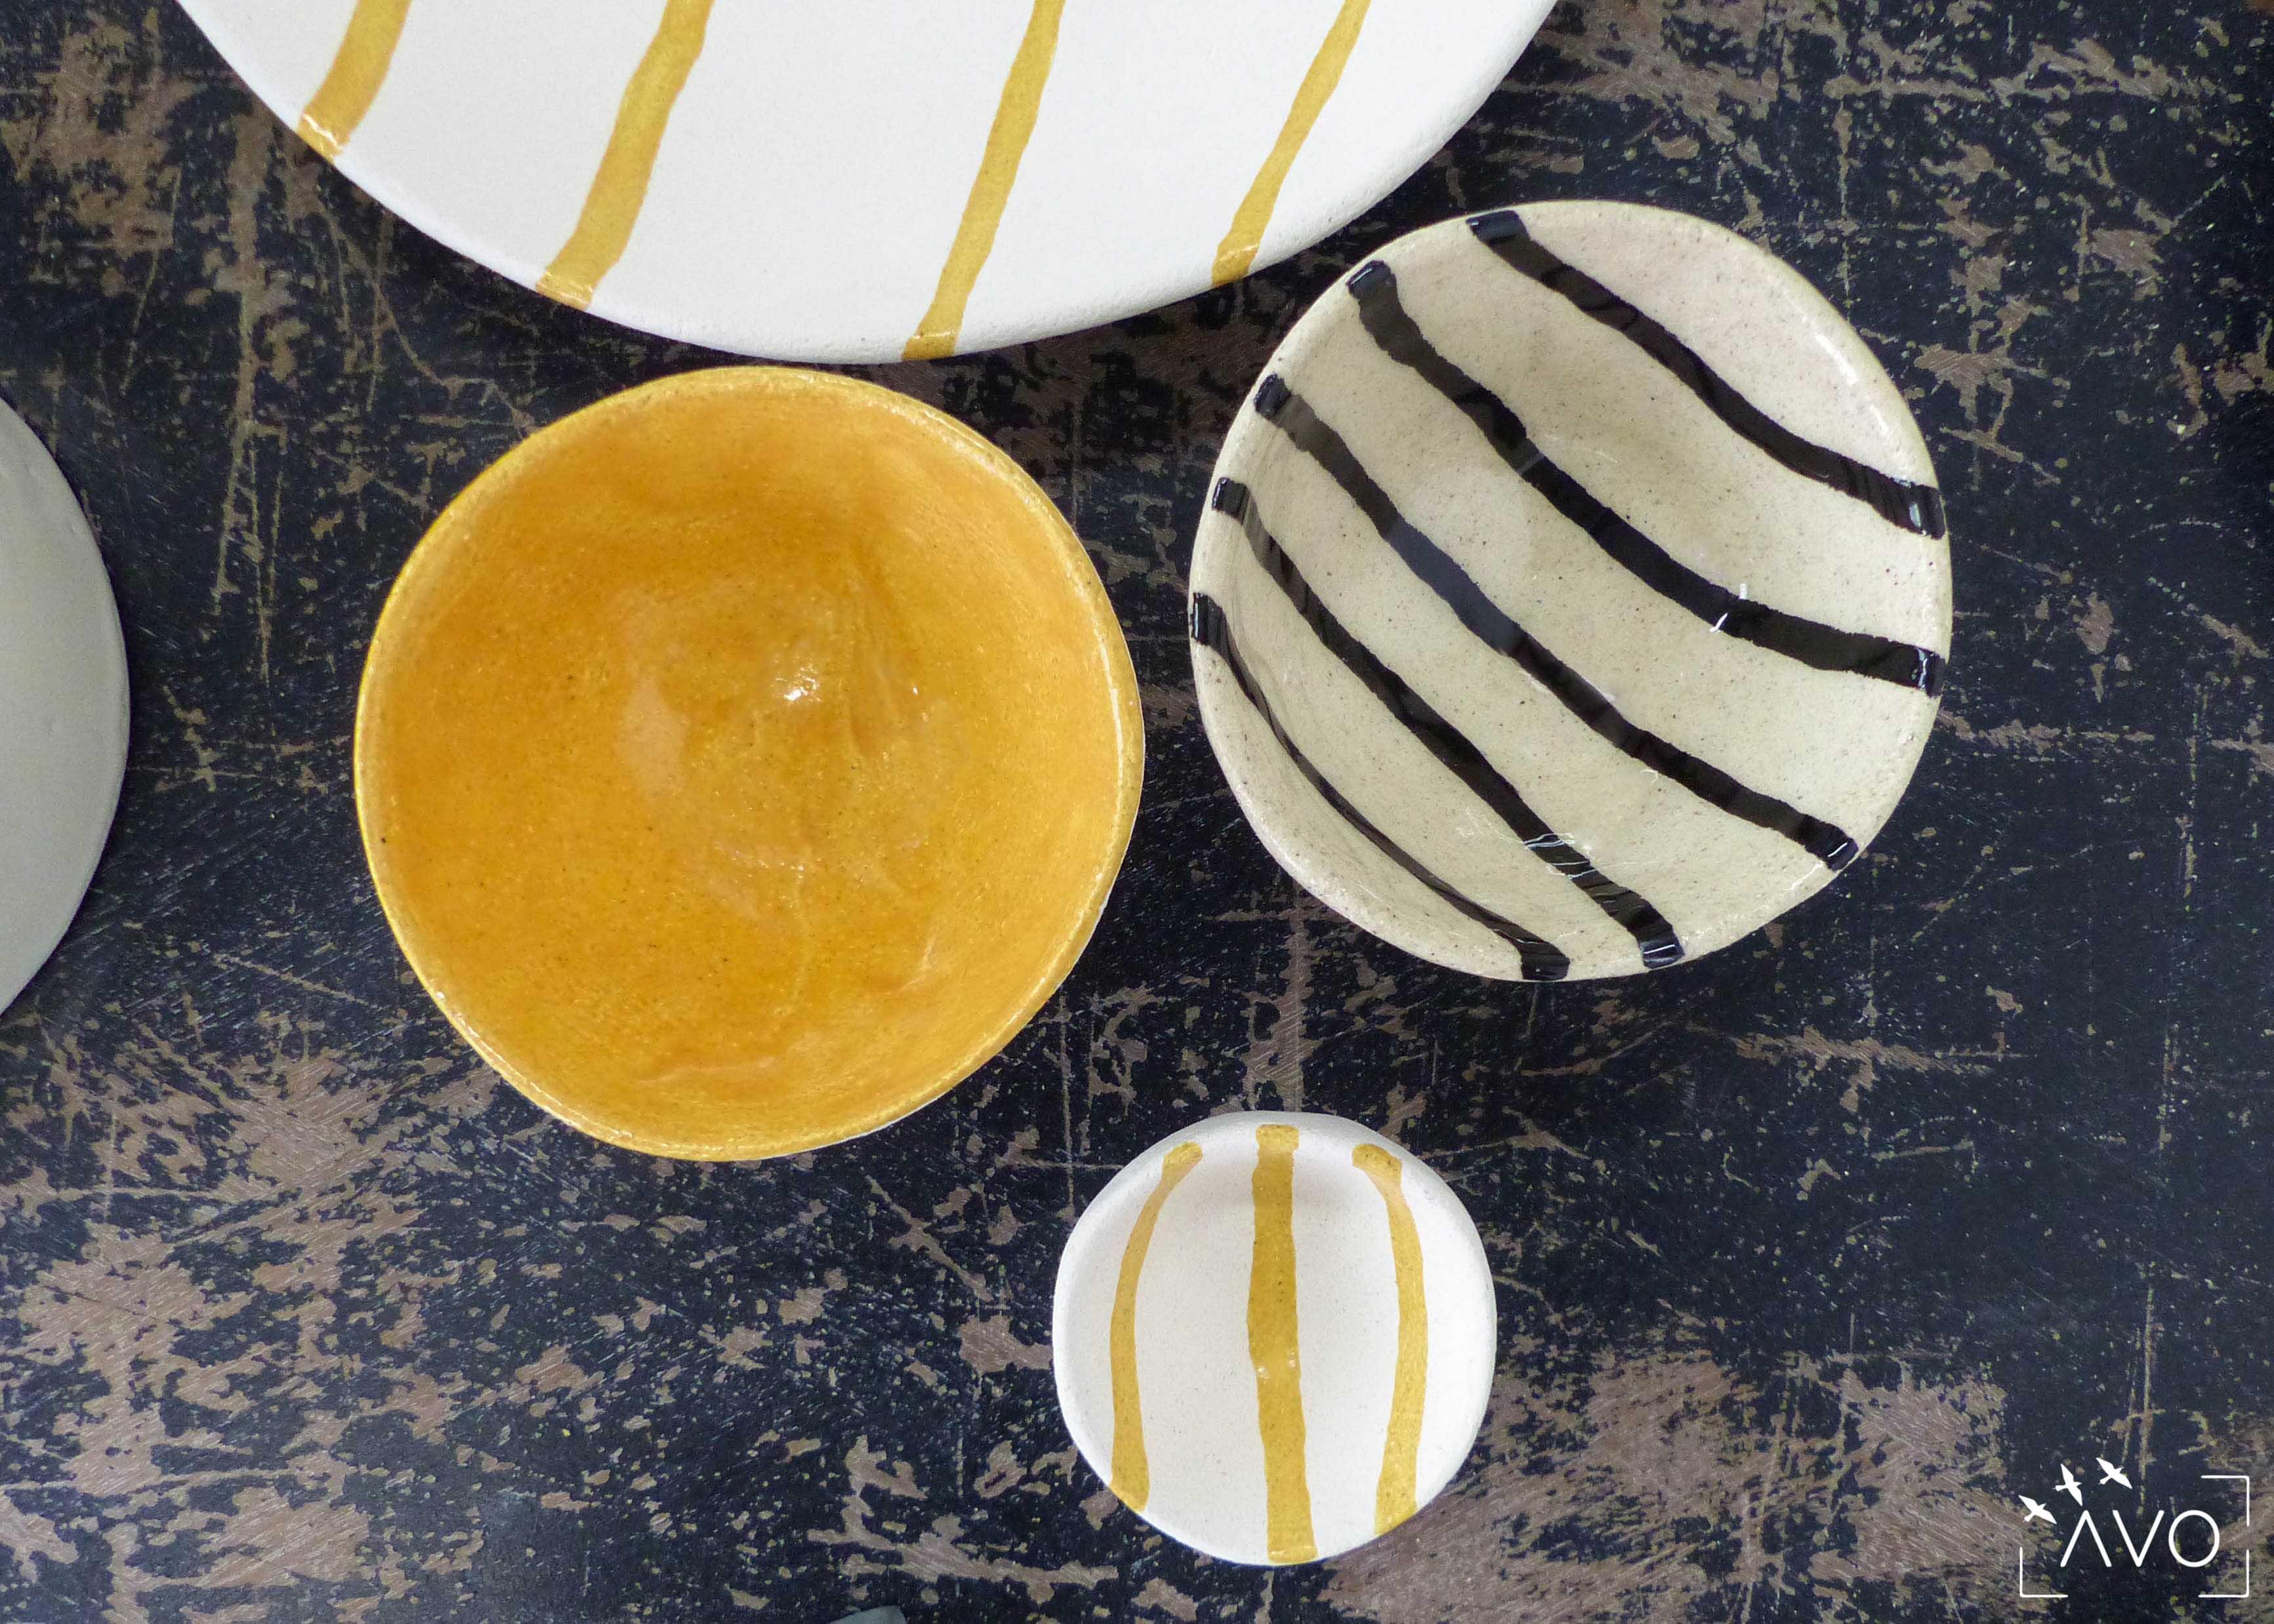 savoir-faire-ceramique-faience-decoration-bol-plat-creatrice-colore-email-terre-local-sabine-orlandini-atelier-rayures-jaune